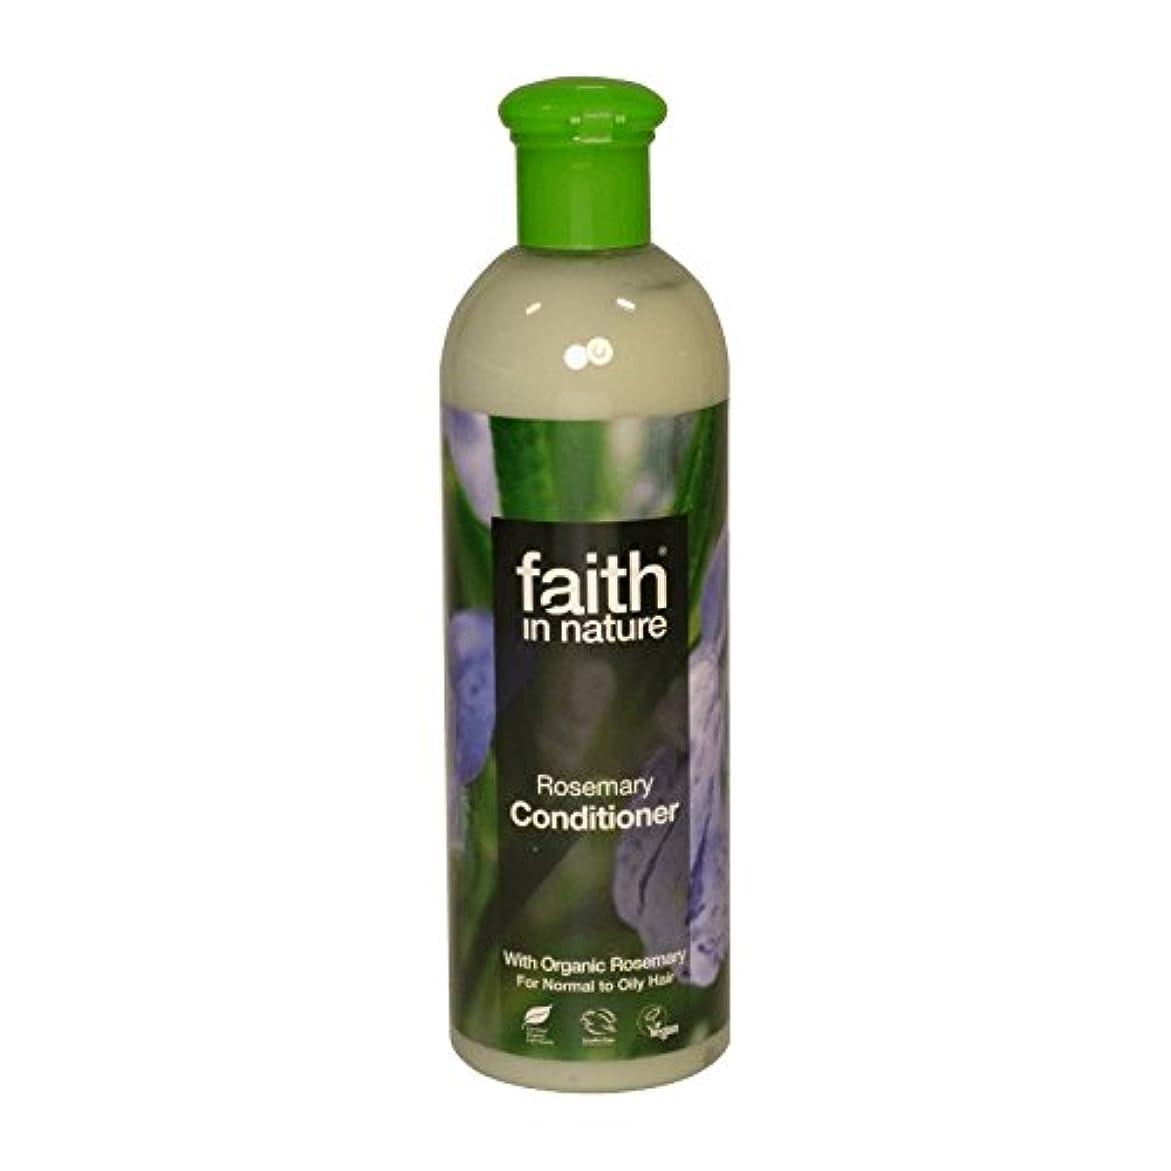 Faith in Nature Rosemary Conditioner 400ml (Pack of 6) - 自然ローズマリーコンディショナー400ミリリットルの信仰 (x6) [並行輸入品]